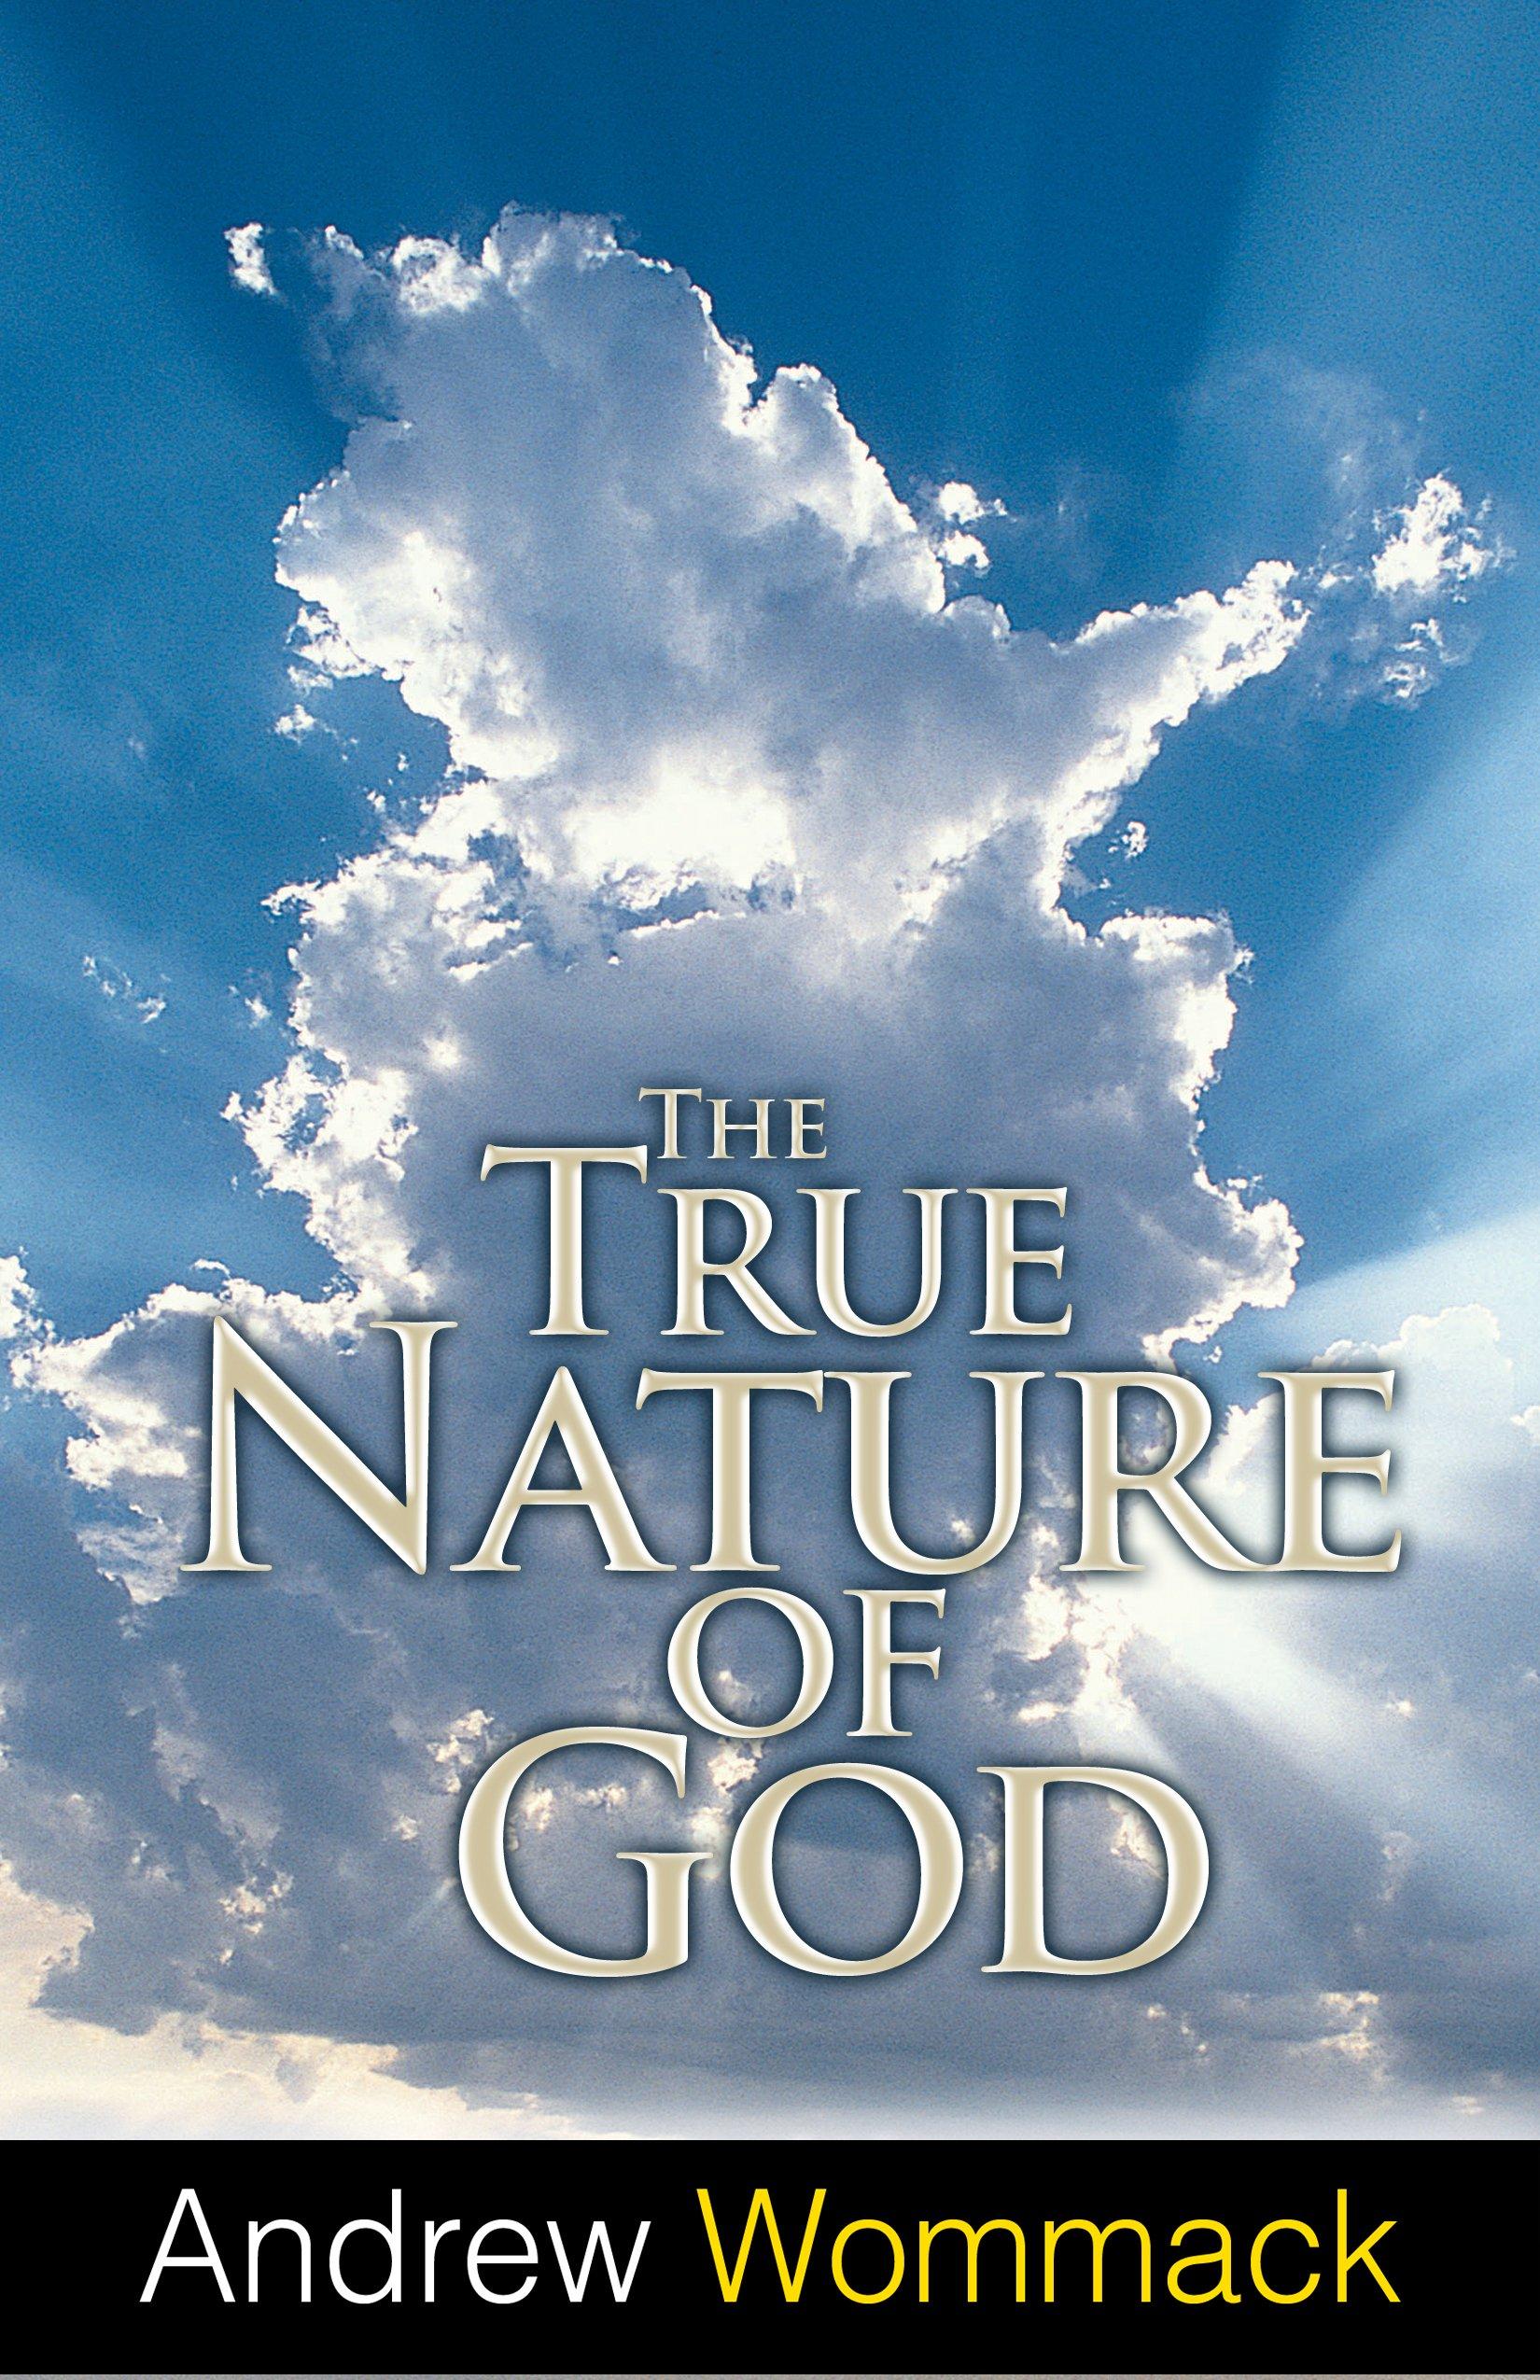 Amazon.com: True Nature of God (9781606835210): Andrew Wommack: Books